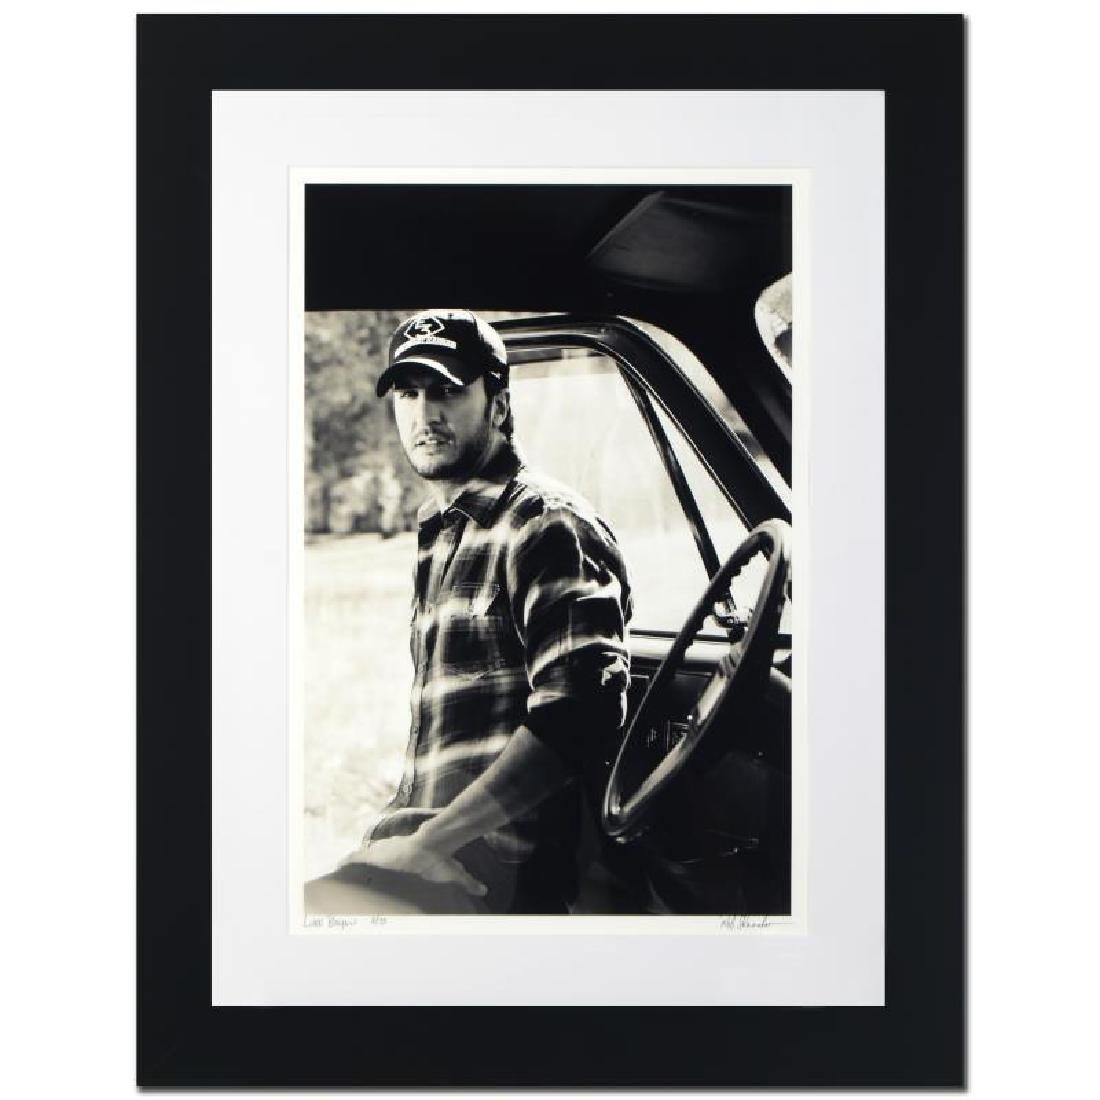 """Luke Bryan"" Limited Edition Giclee by Rob Shanahan"